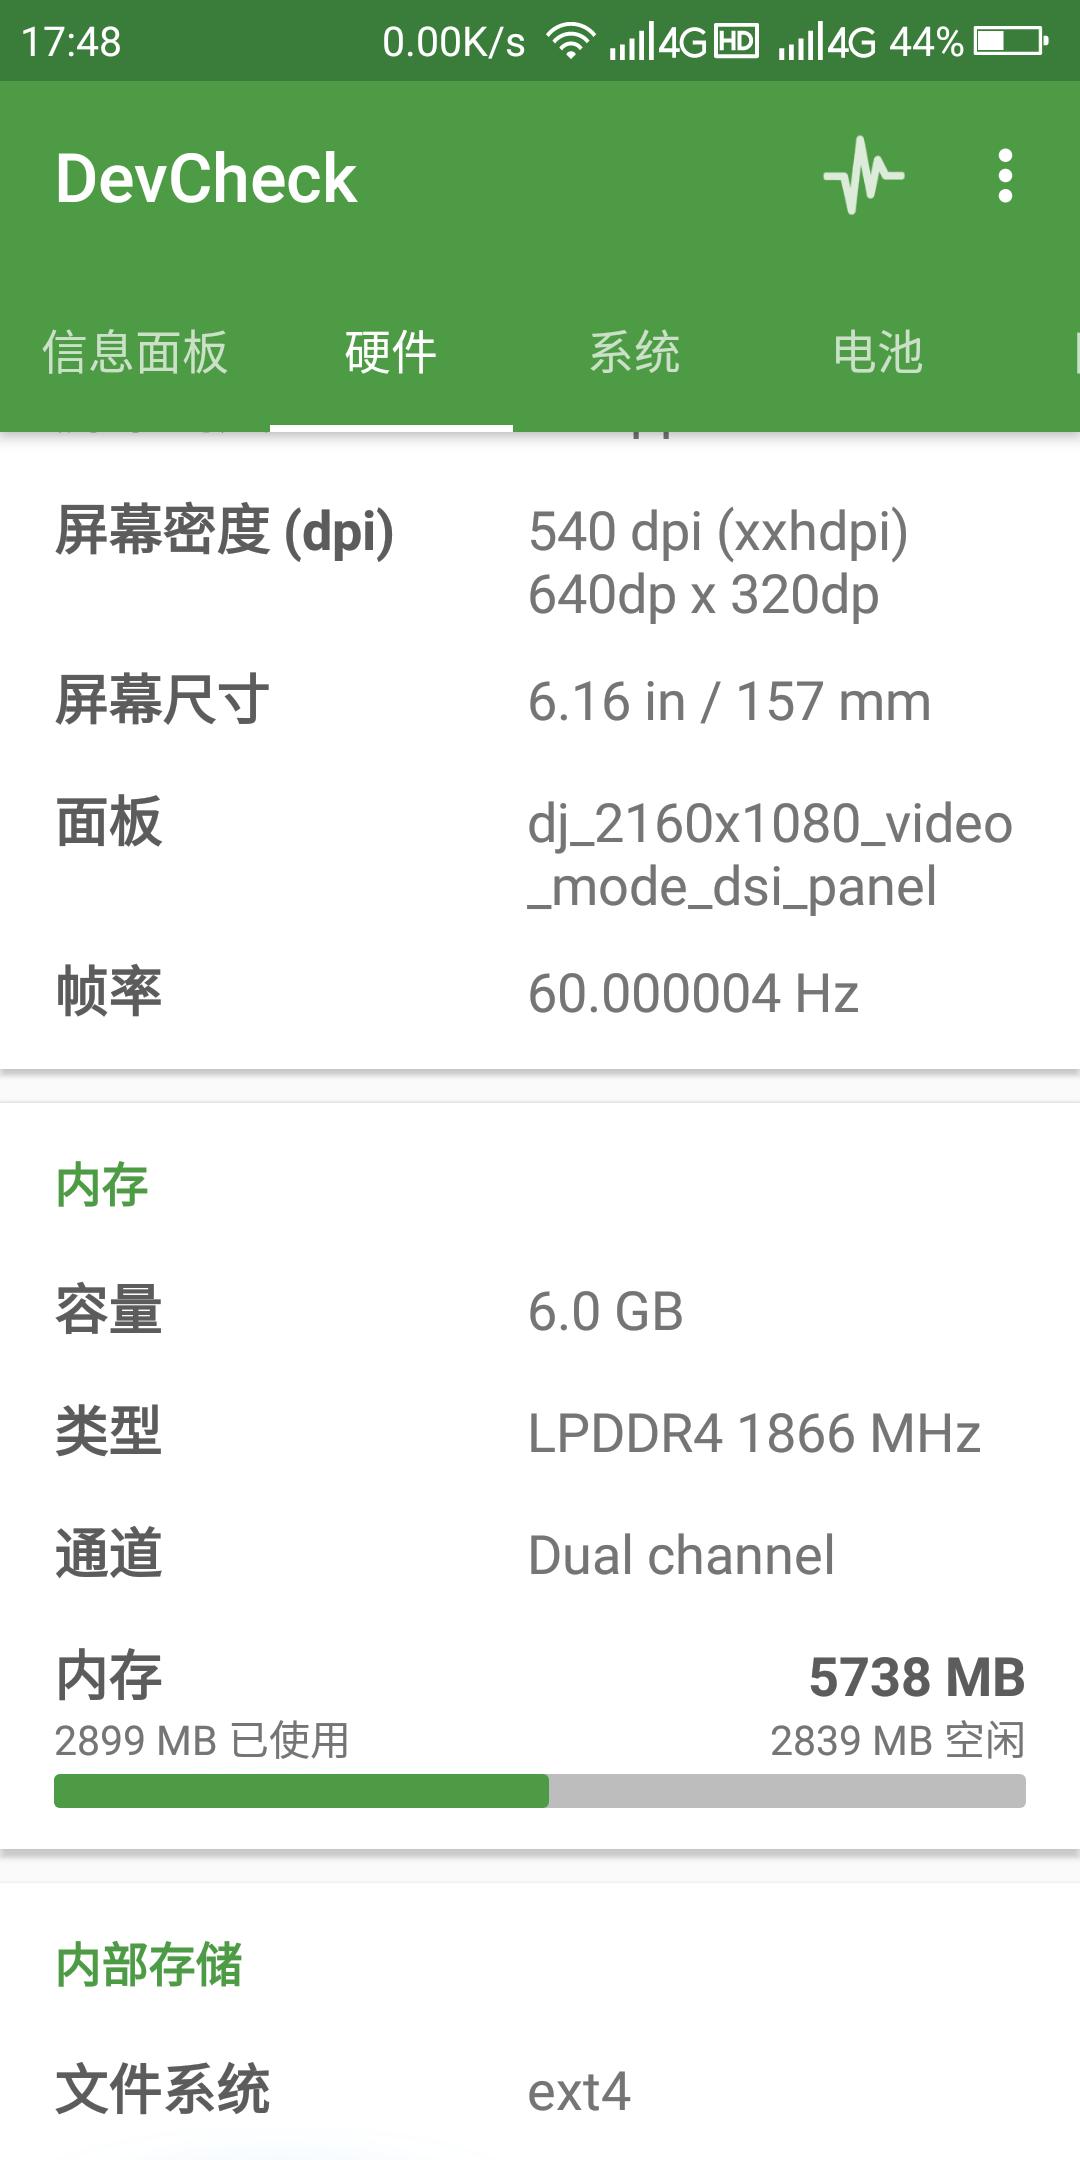 Screenshot_2018-10-12-17-48-53.png